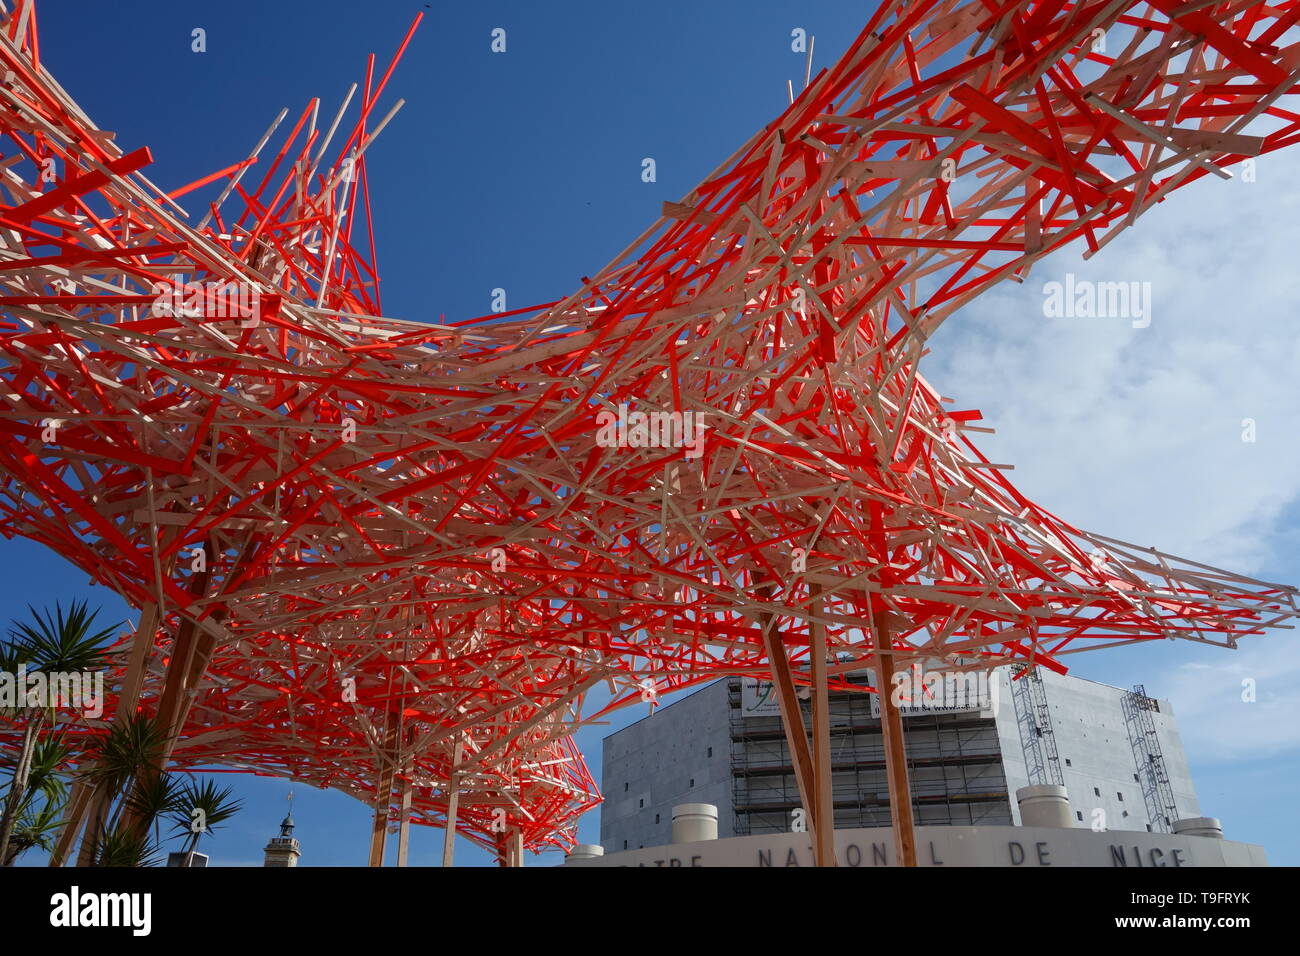 Nizza, Musee d'art moderne et d'art contemporain de Nice, Installation Tribut an Alexander Calder von Arne Quinze - Nice, Musee d'art moderne et d'art Stock Photo